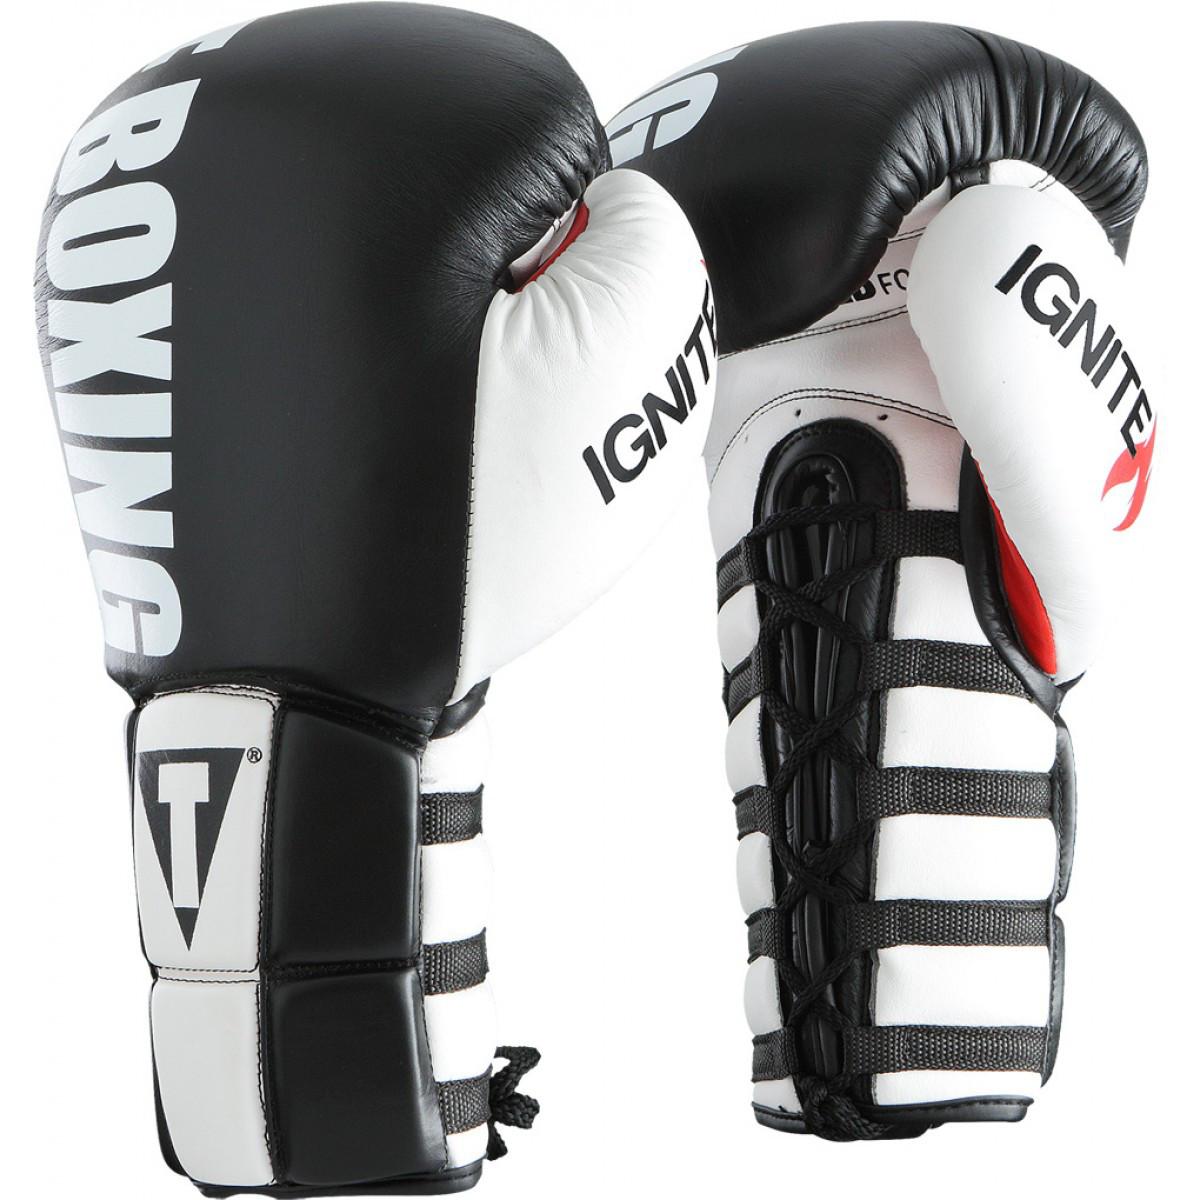 Боксерські рукавички TITLE Infused Foam Ignite Power Lace Training